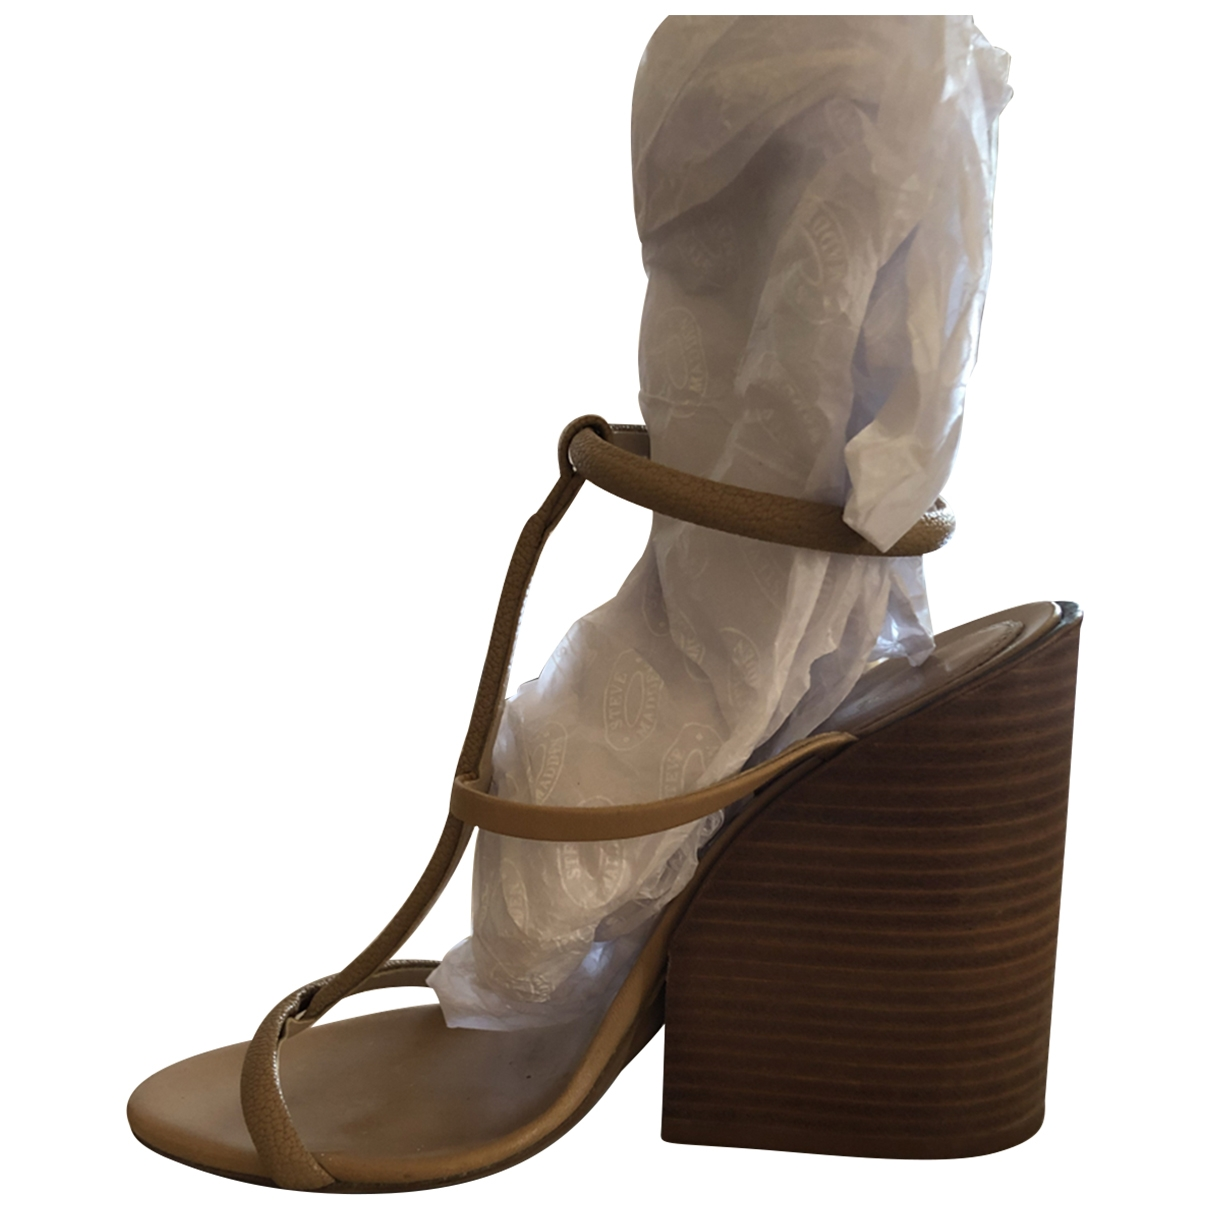 Chloé \N Beige Leather Sandals for Women 38 EU